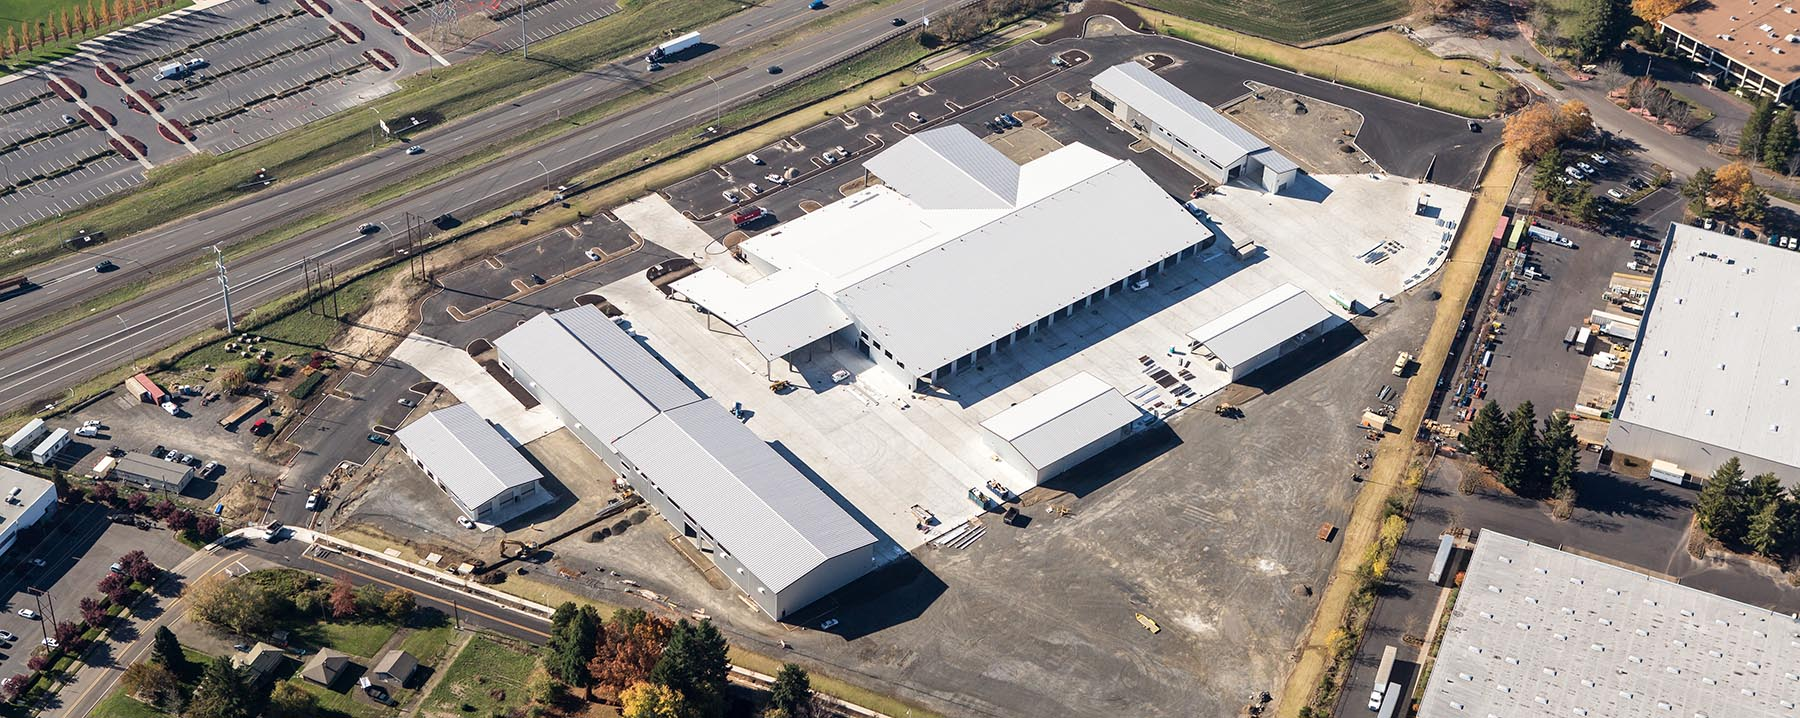 custom manufacturing development